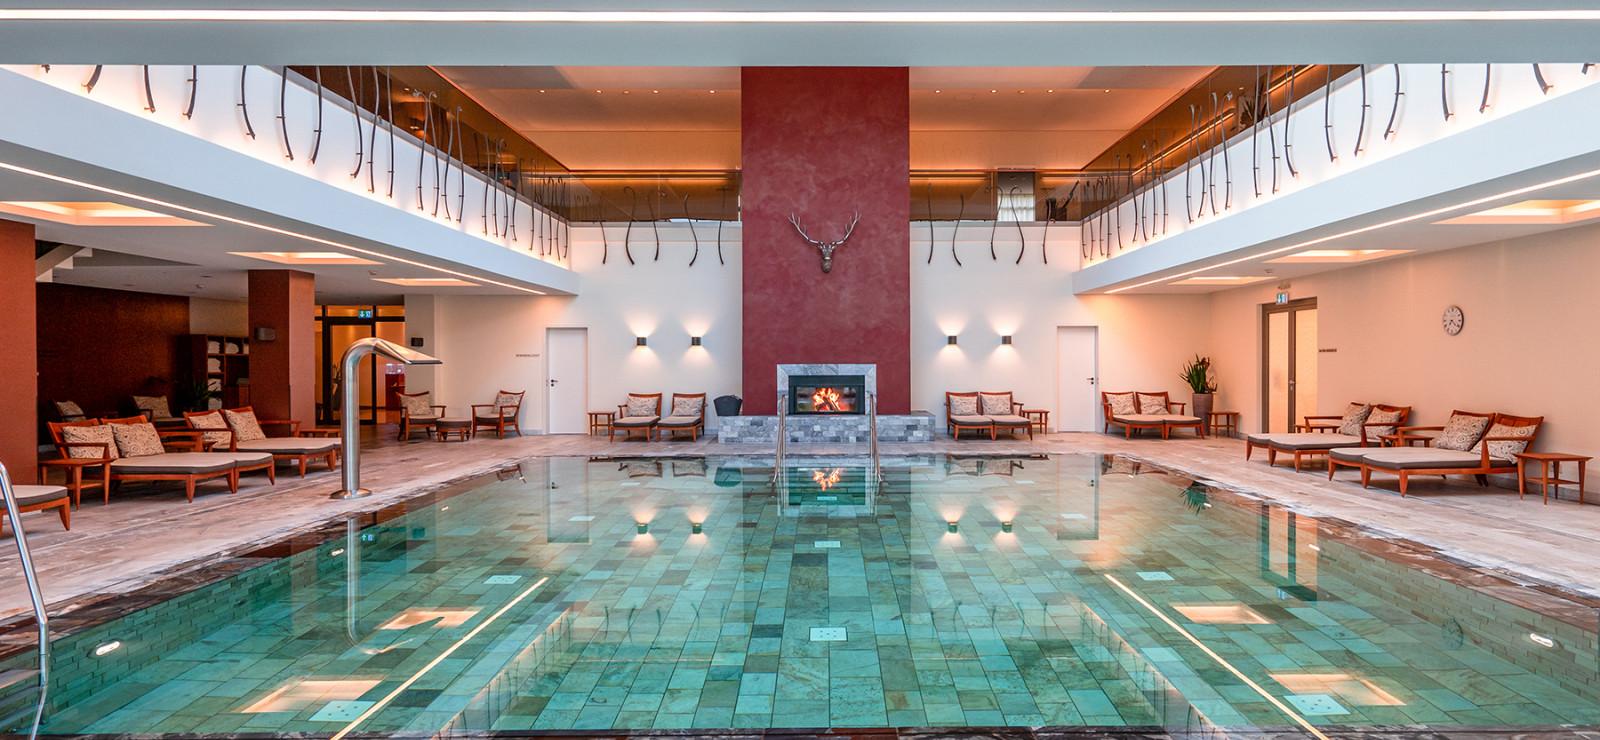 wellnesshotels kraichgau ab 67 bewertungen wellness heaven. Black Bedroom Furniture Sets. Home Design Ideas